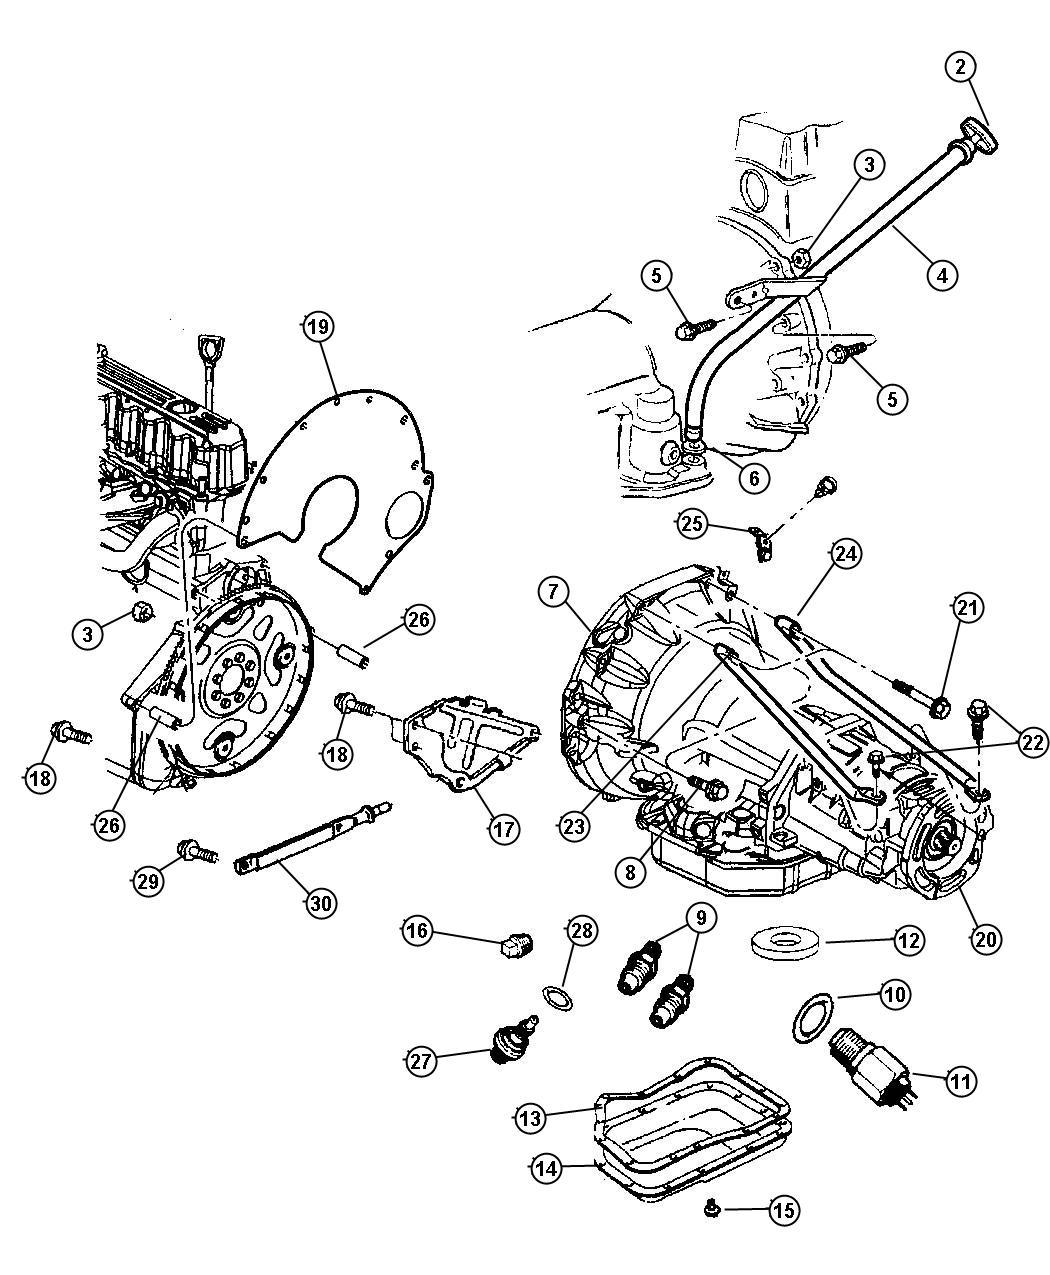 Jeep Grand Cherokee Bracket  Battery Wiring  Tube  Vent Tube